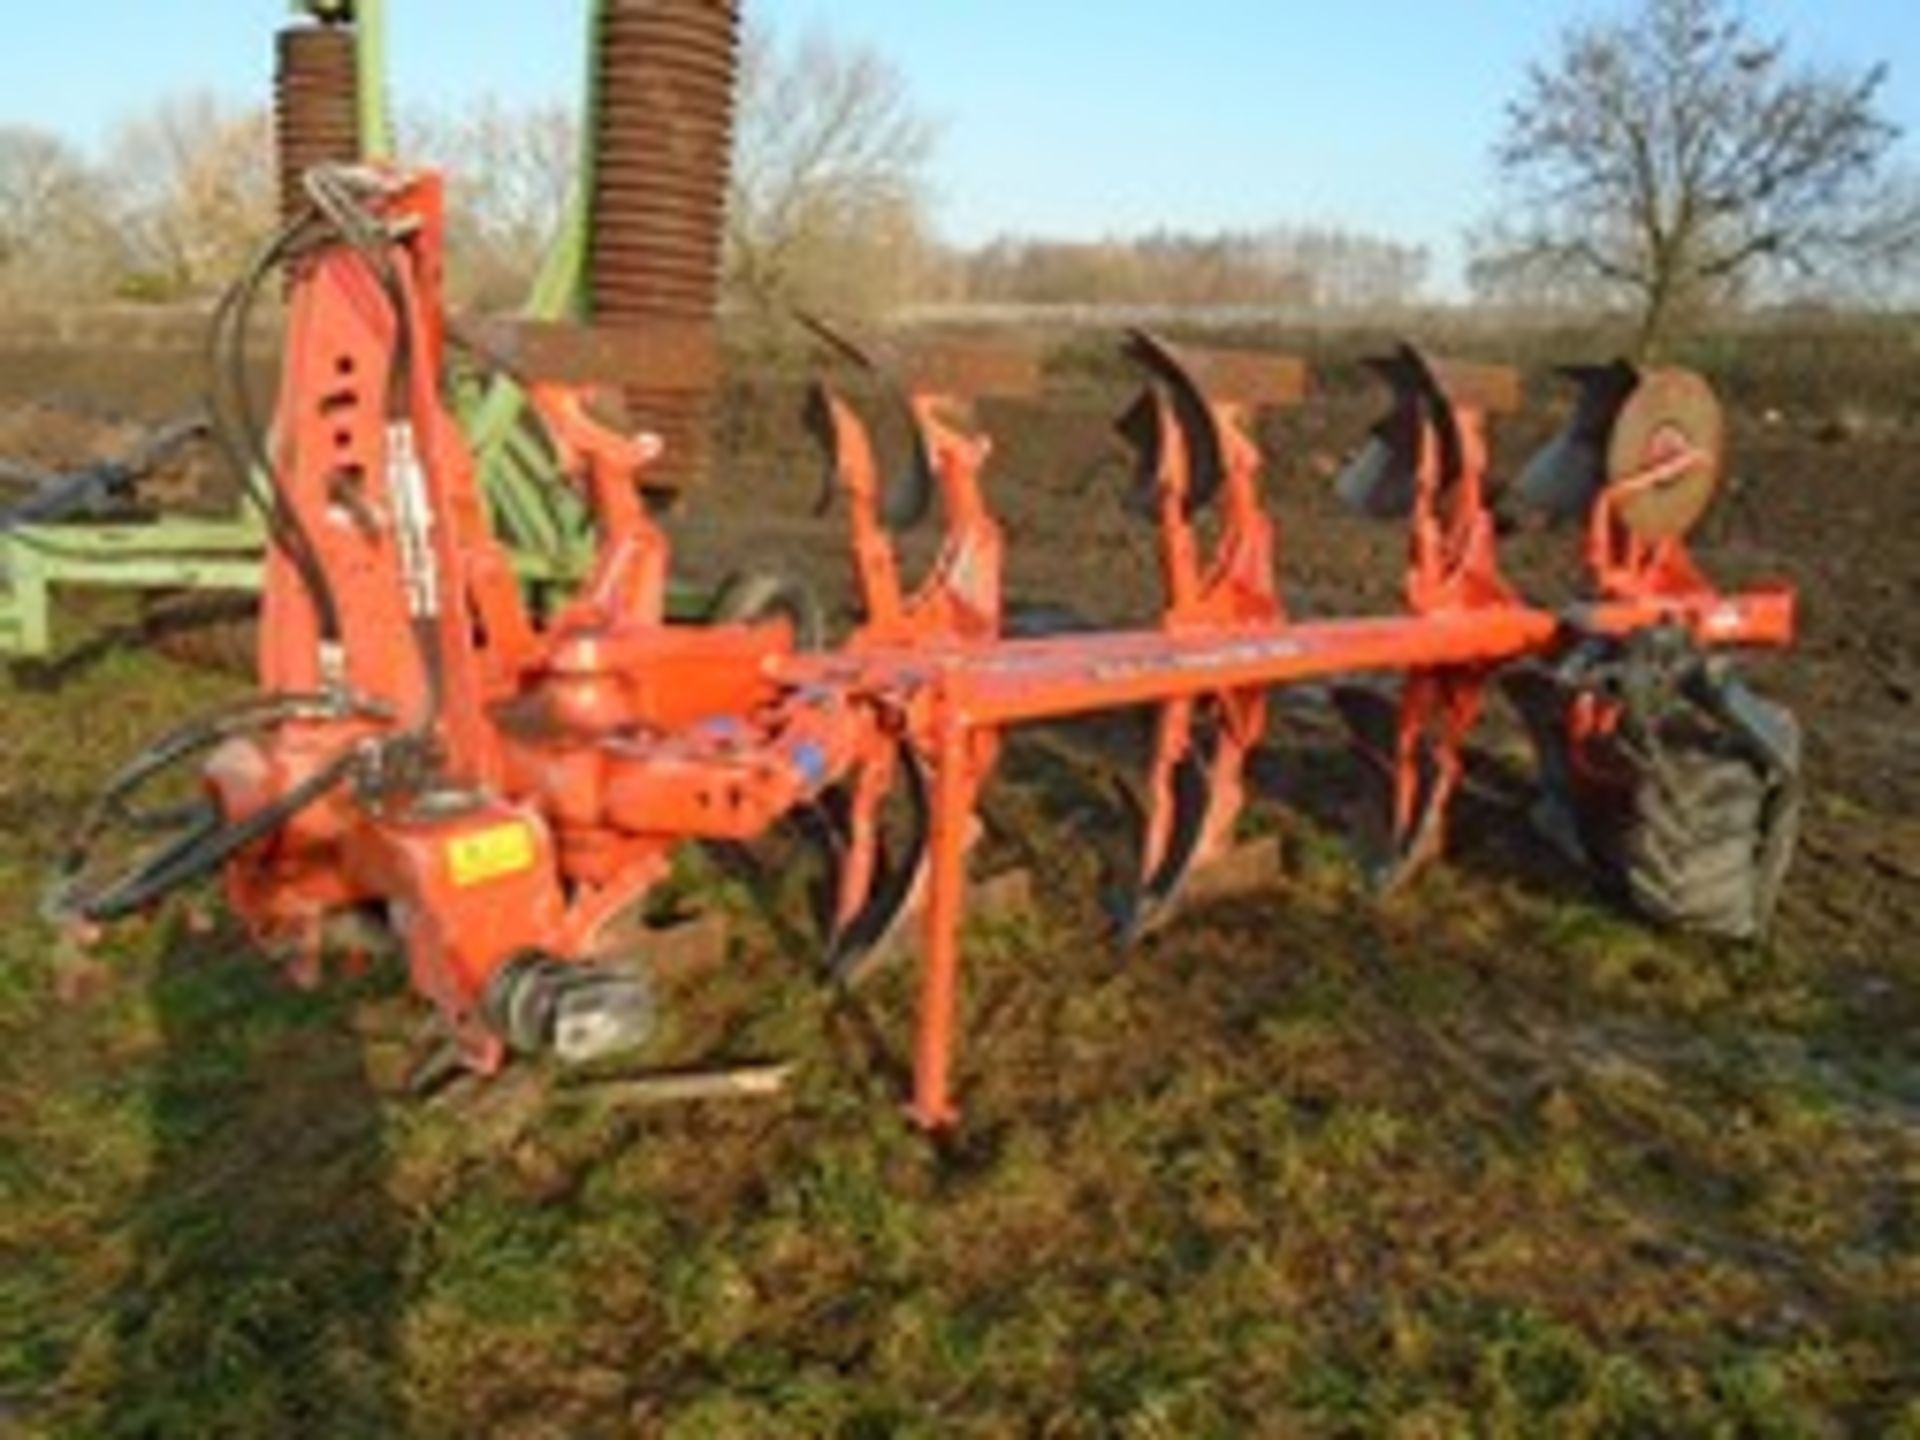 Lot 35 - Kuhn Multi-Master 123 5f plough 2017, little use